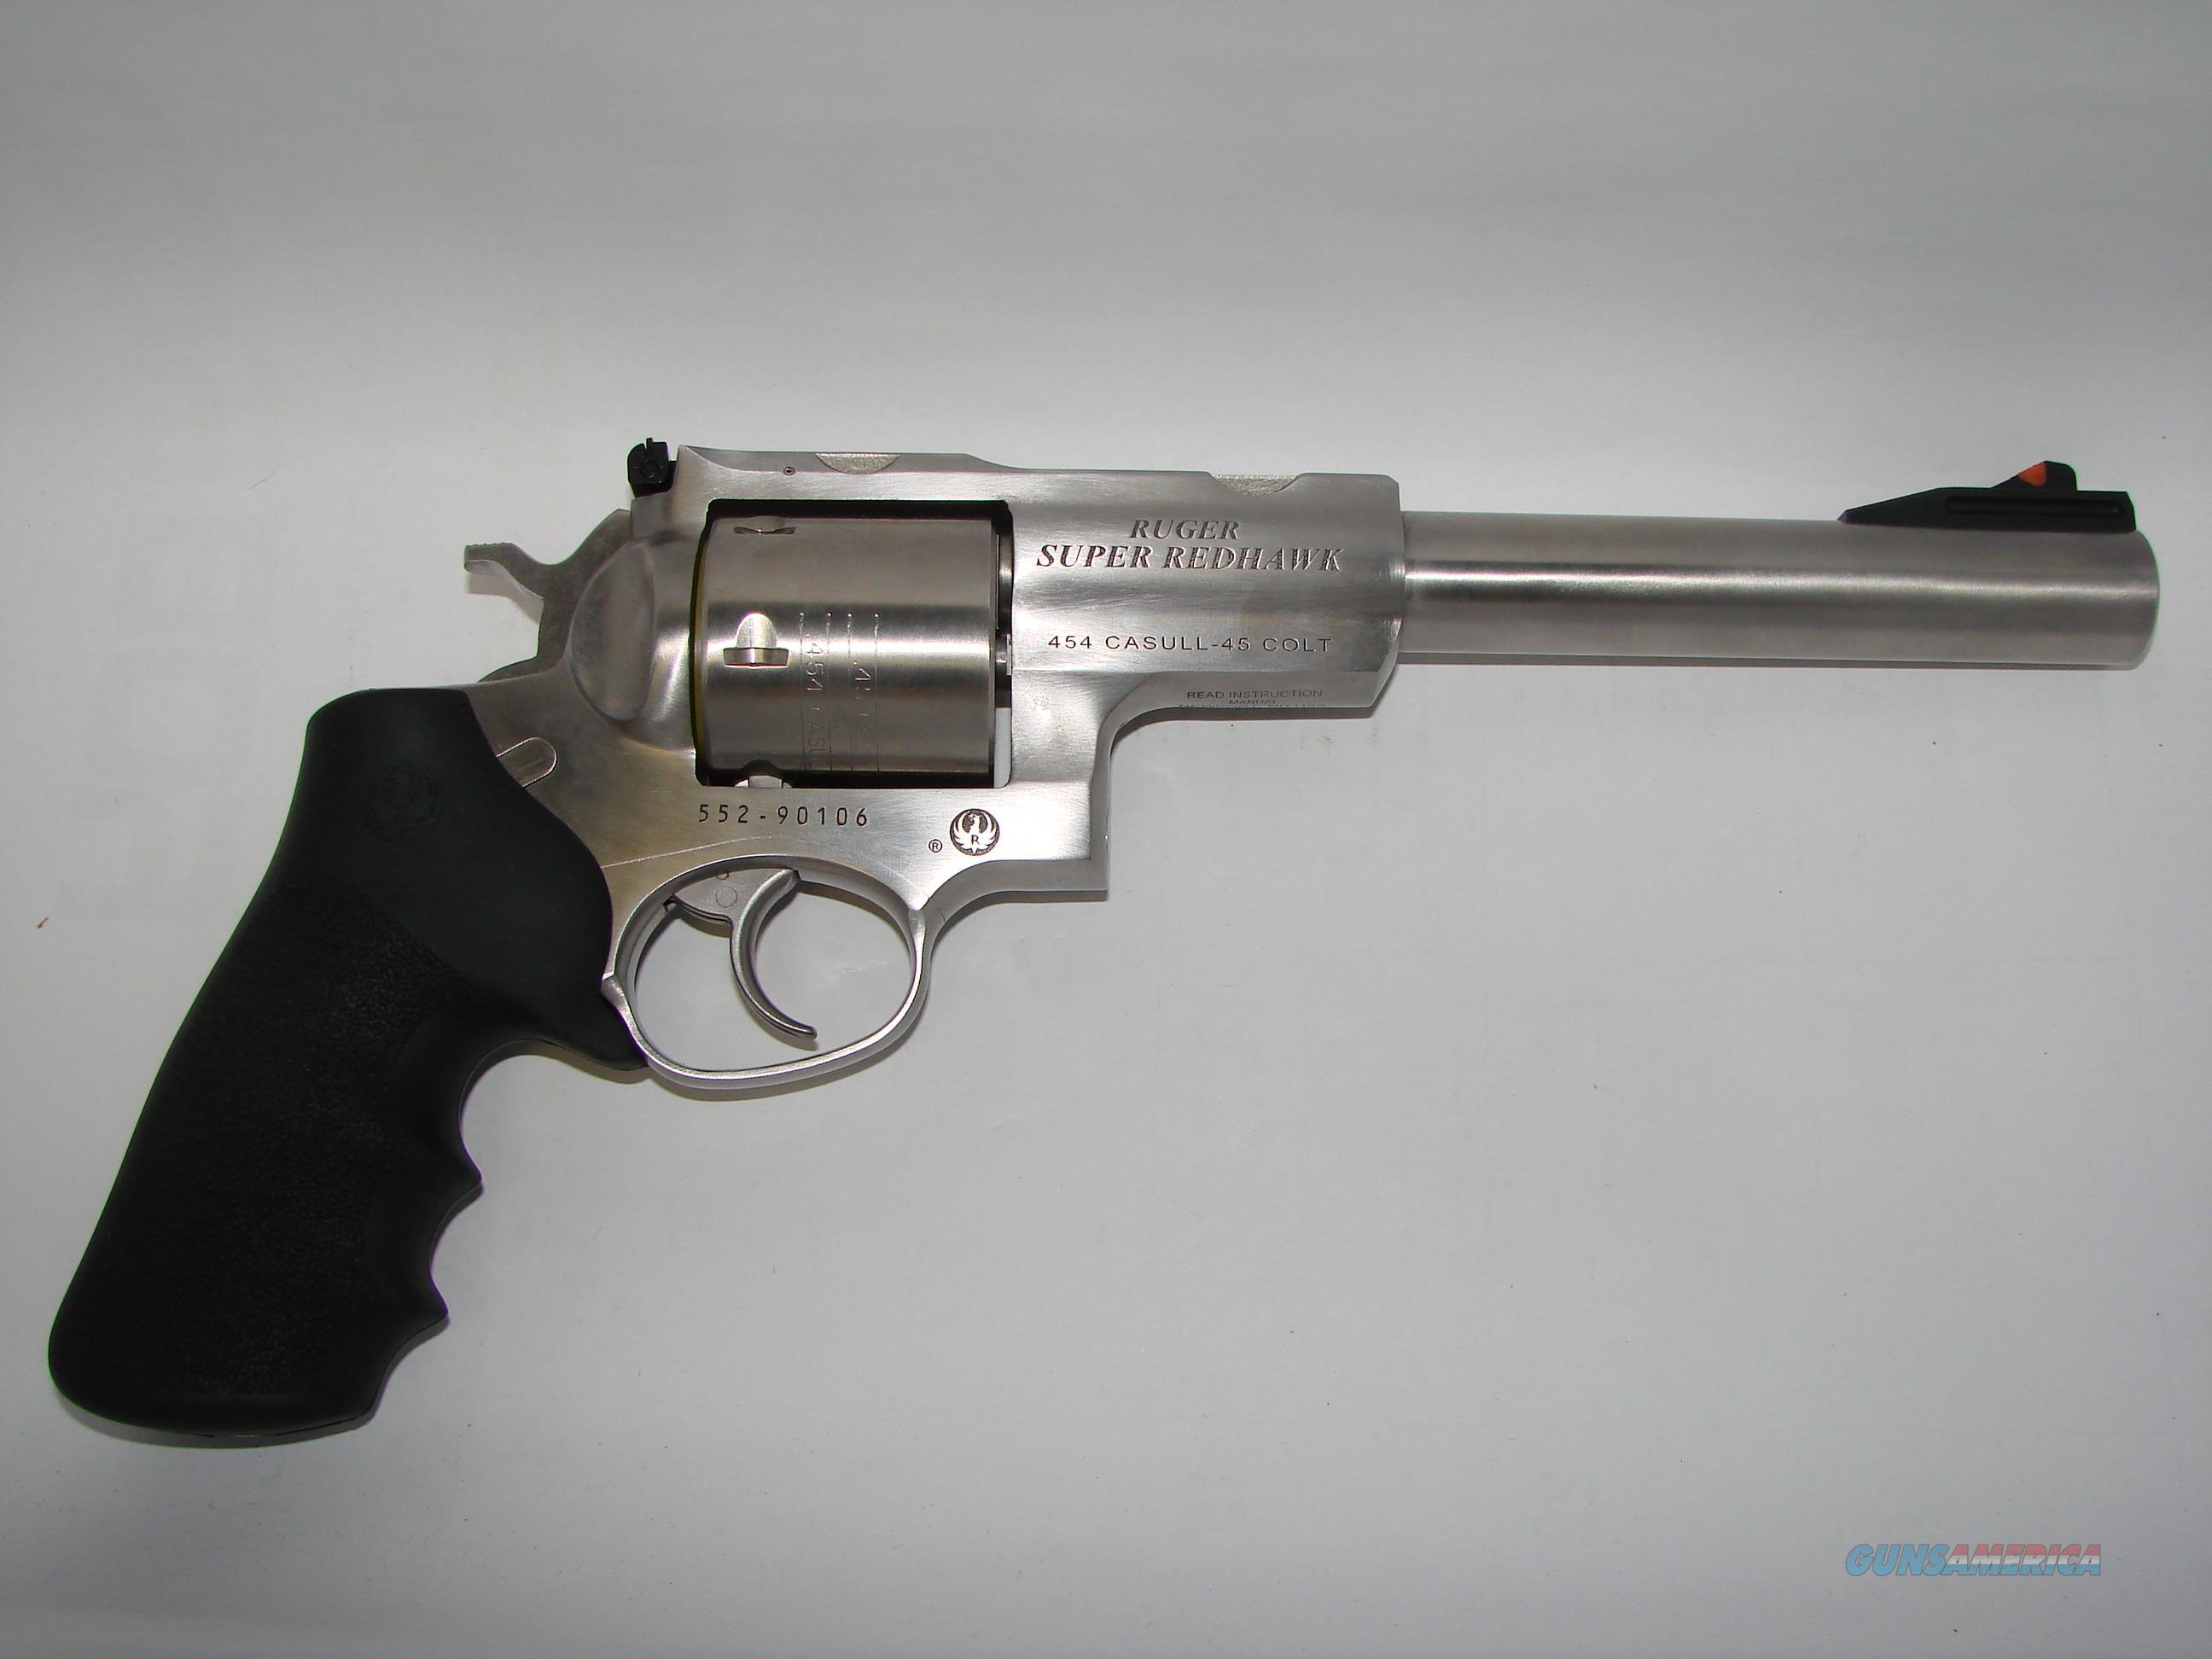 Ruger Super Redhawk  Guns > Pistols > Ruger Double Action Revolver > Redhawk Type